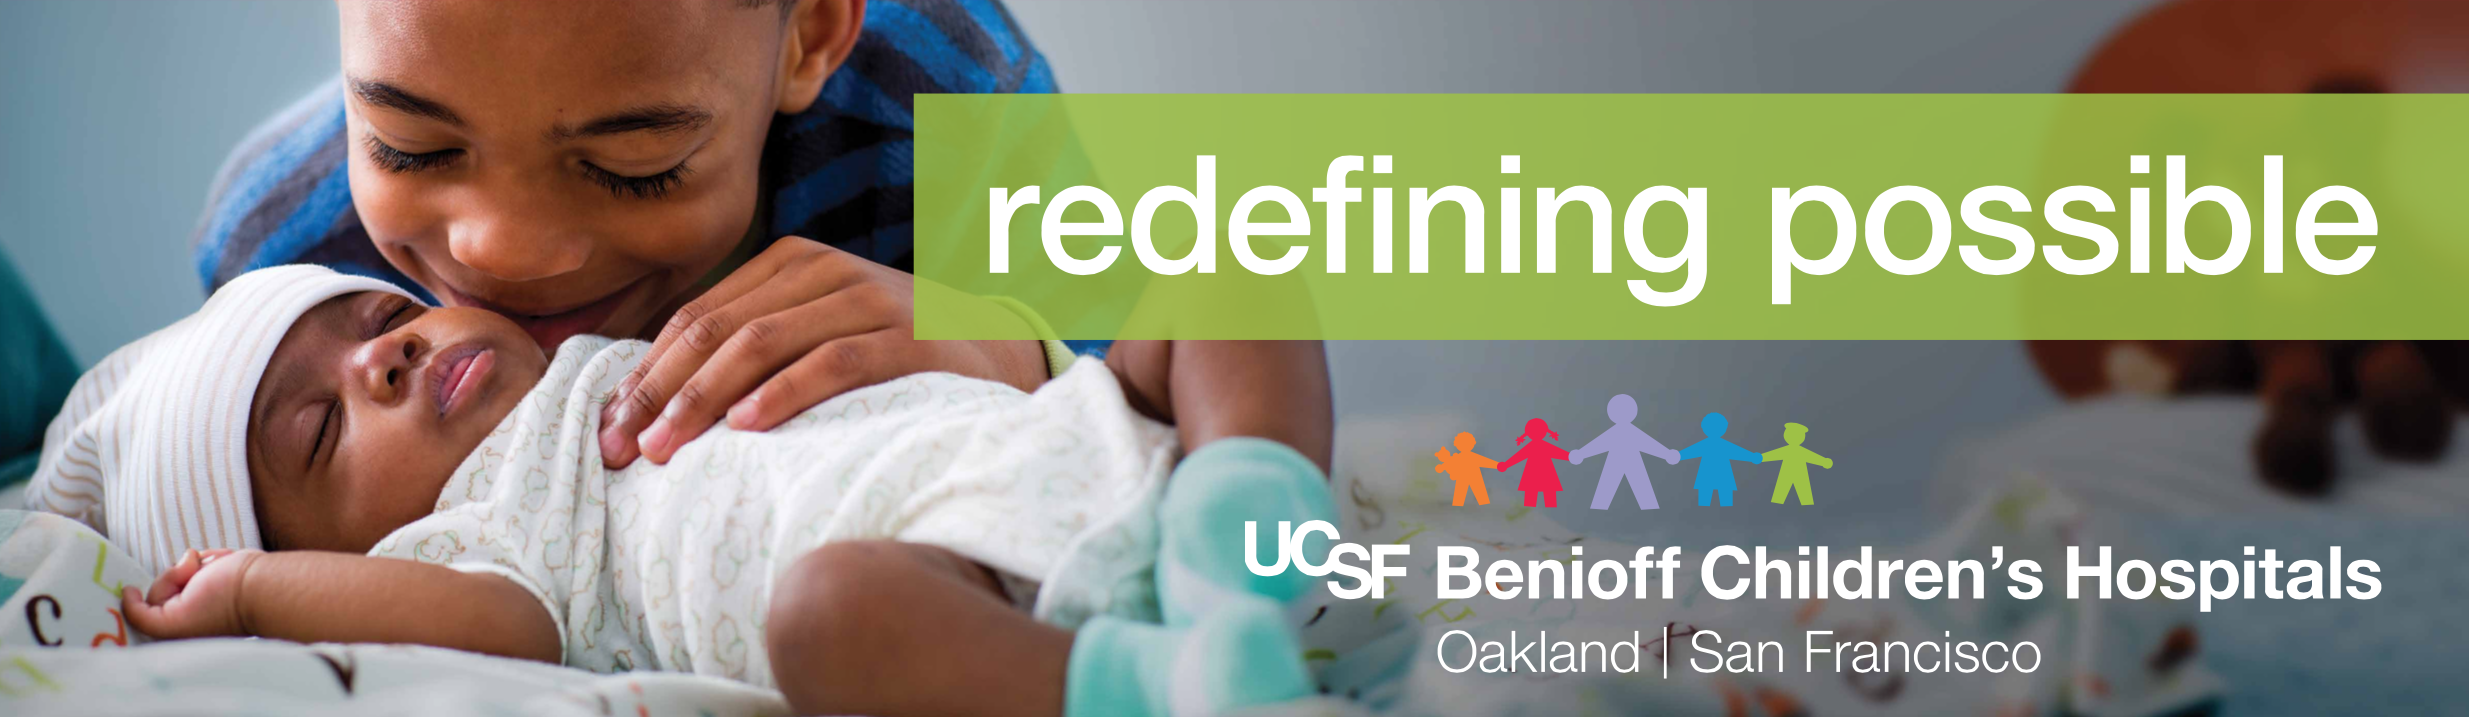 Photographer: Eva Kolenko for UCSF Benioff Children's Hospital